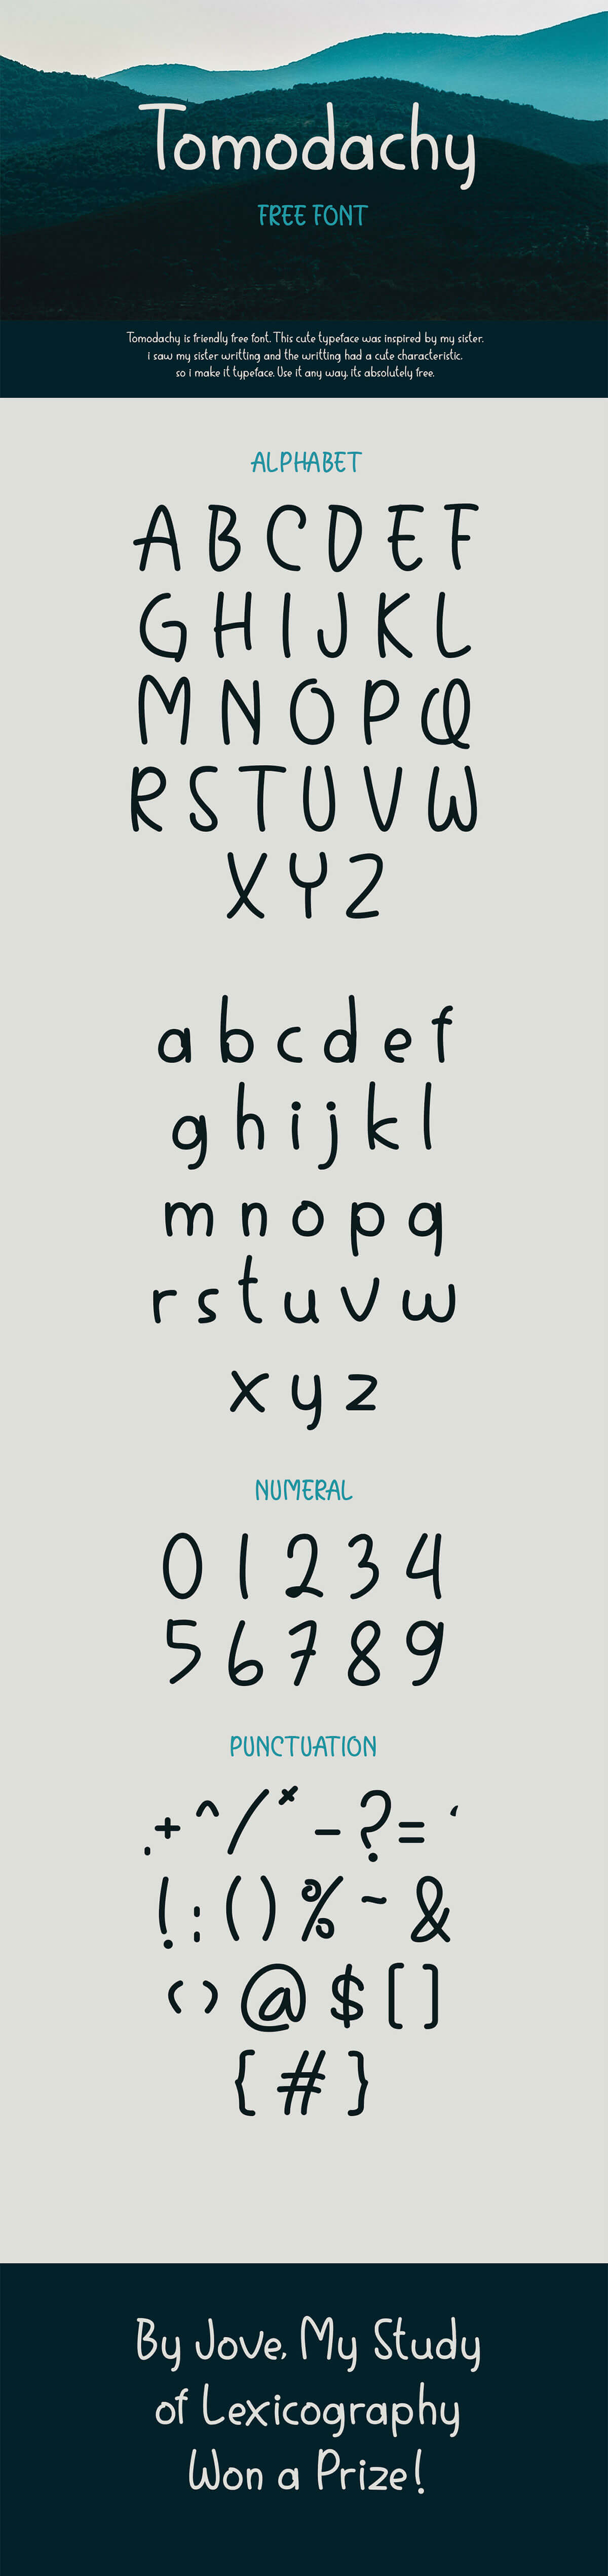 Free Tomodachy Handwriting Font